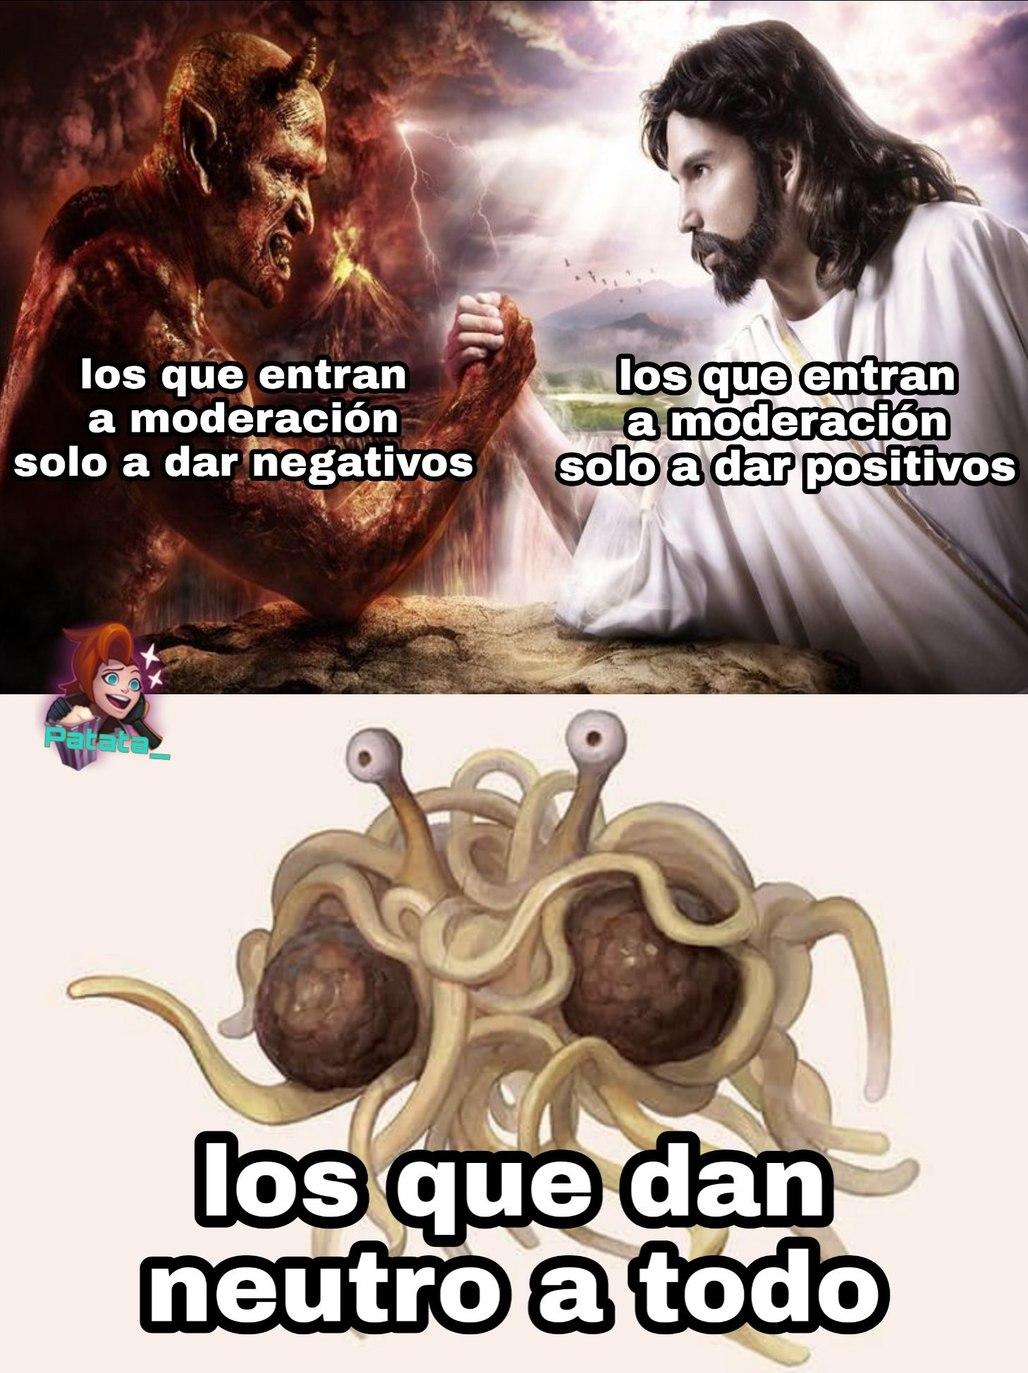 obviamente tú eres un dios bueno ♡ - meme